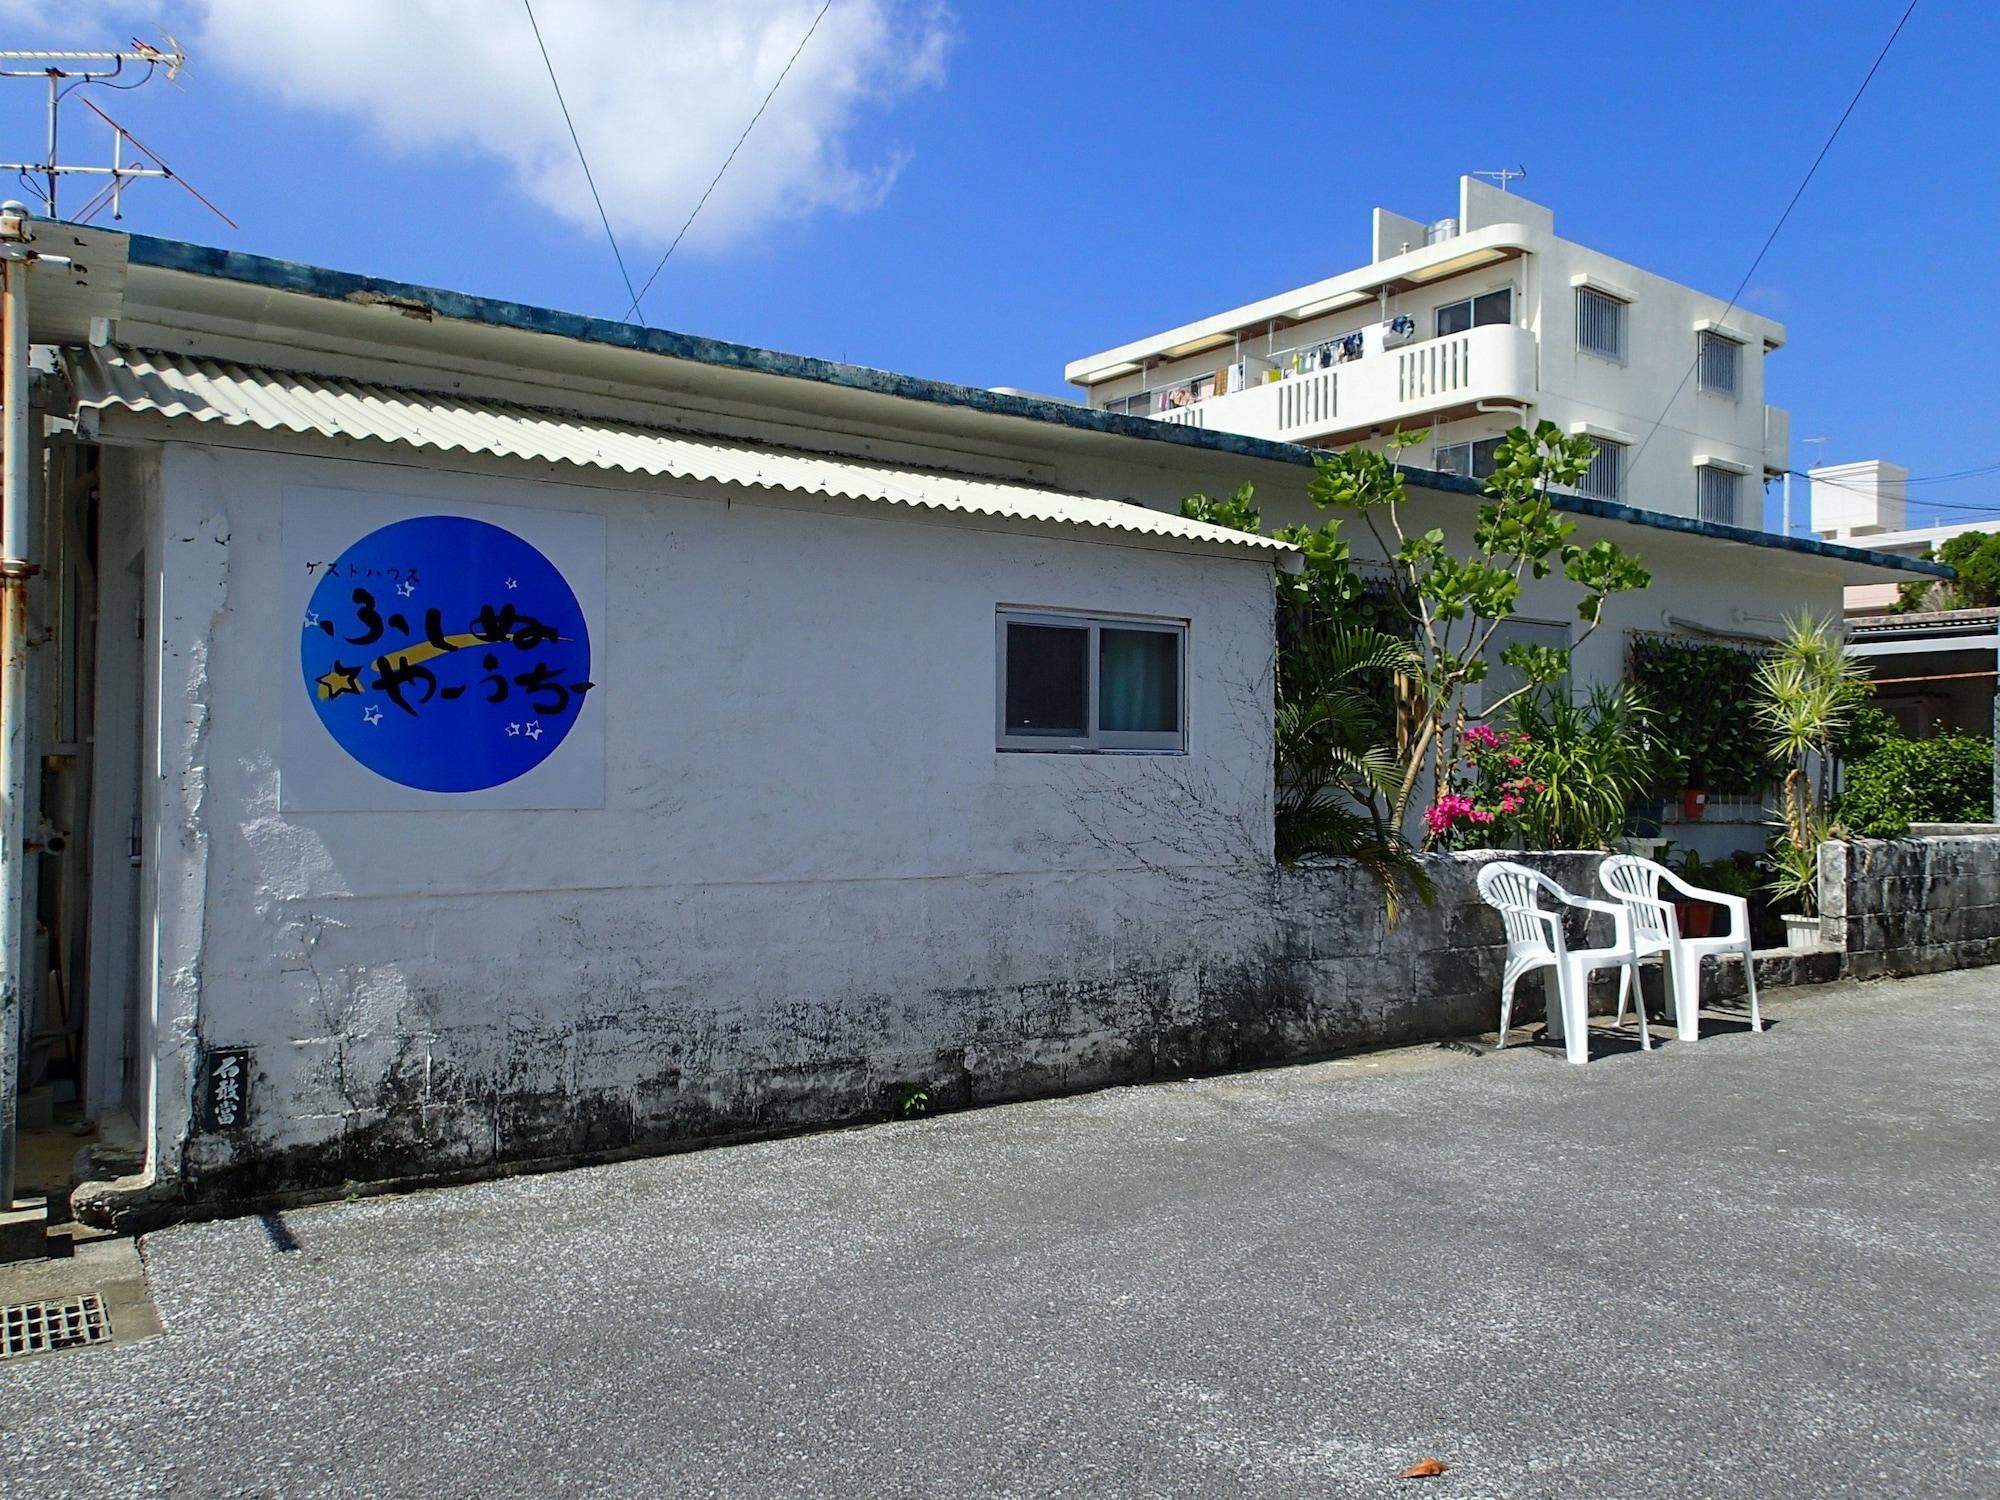 Okinawa Guest House Fushinuyauchi - Hostel, Yomitan